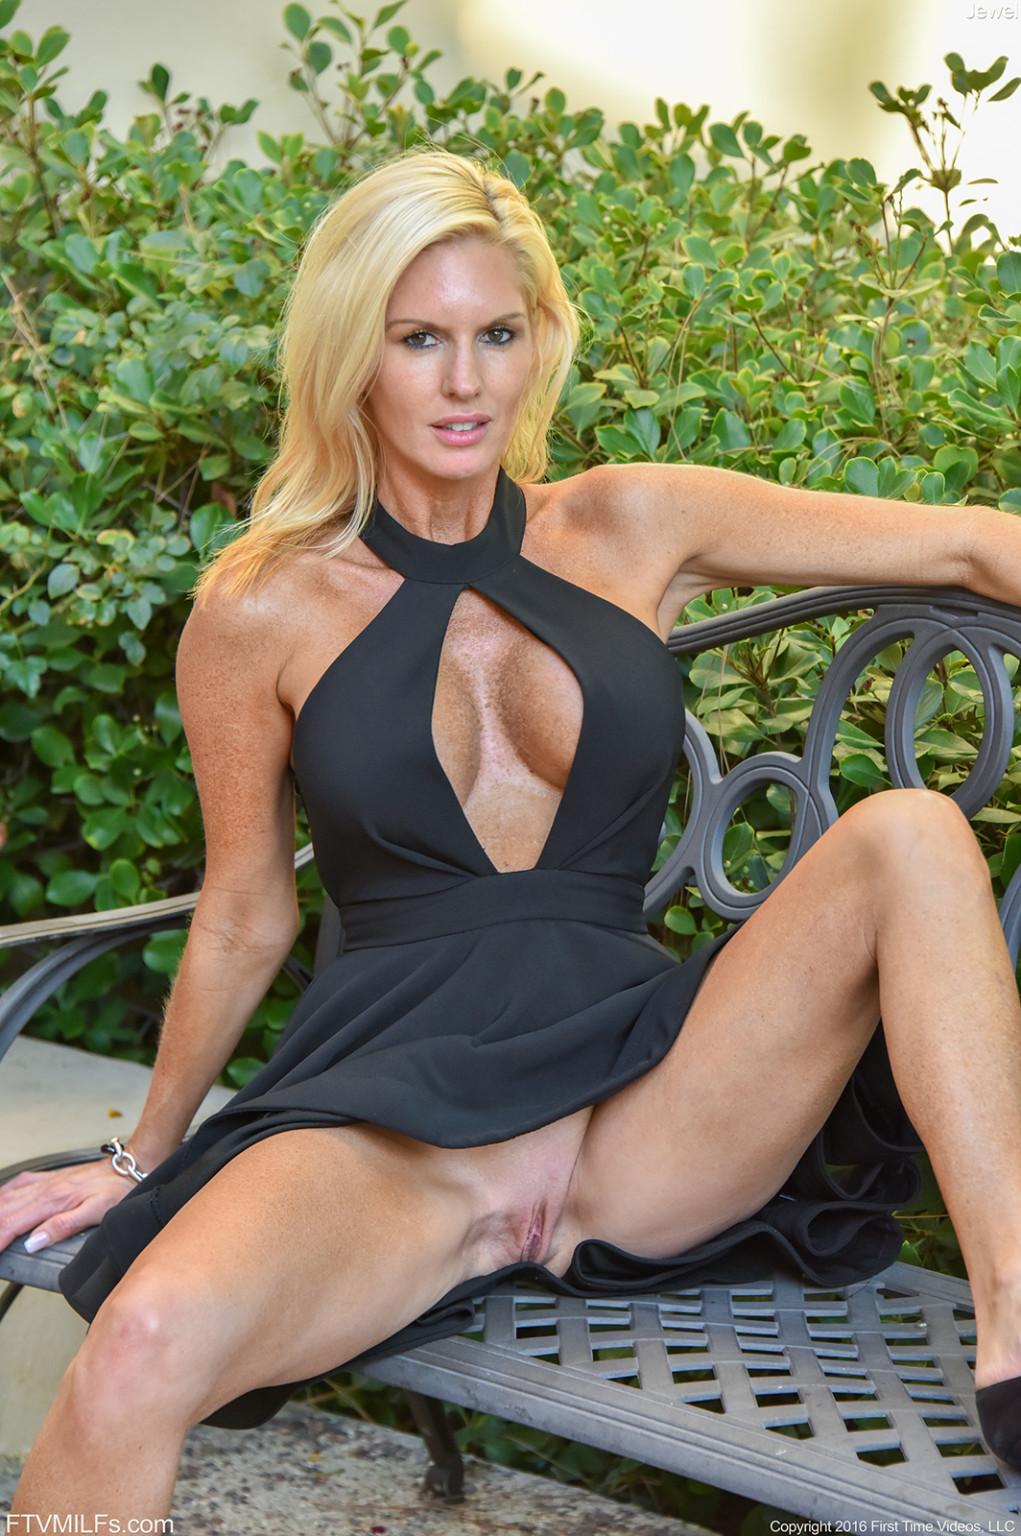 Blonde Big Tits Swimming Pool